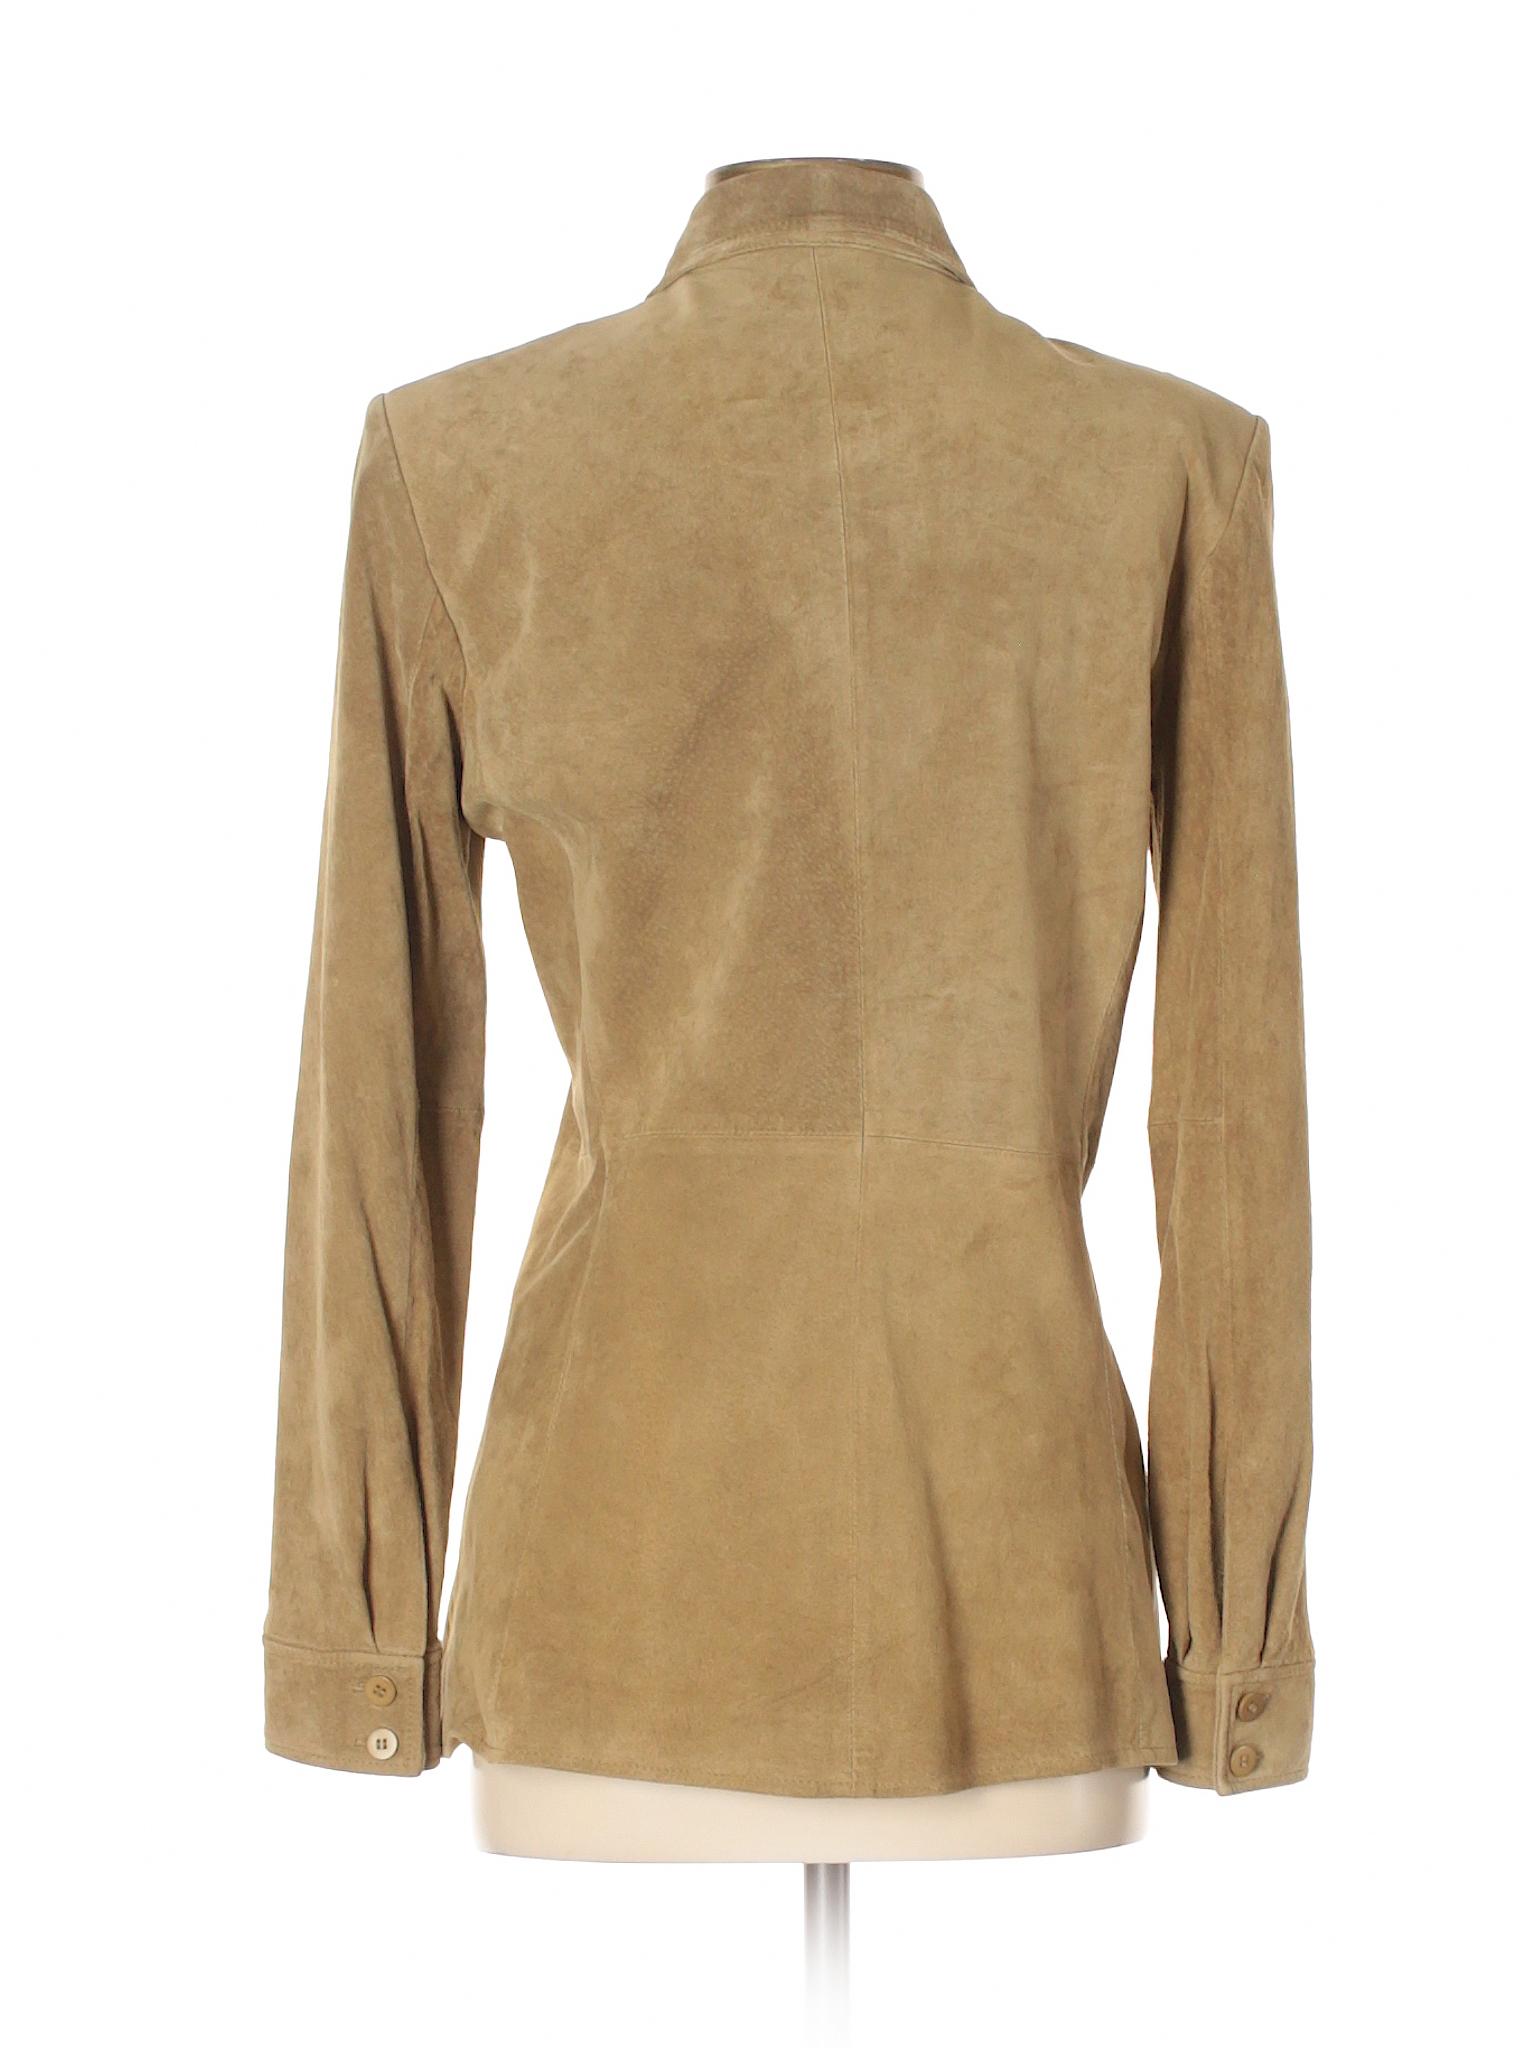 Jacket Liz winter Claiborne Leather Boutique gXqpRw7IxW